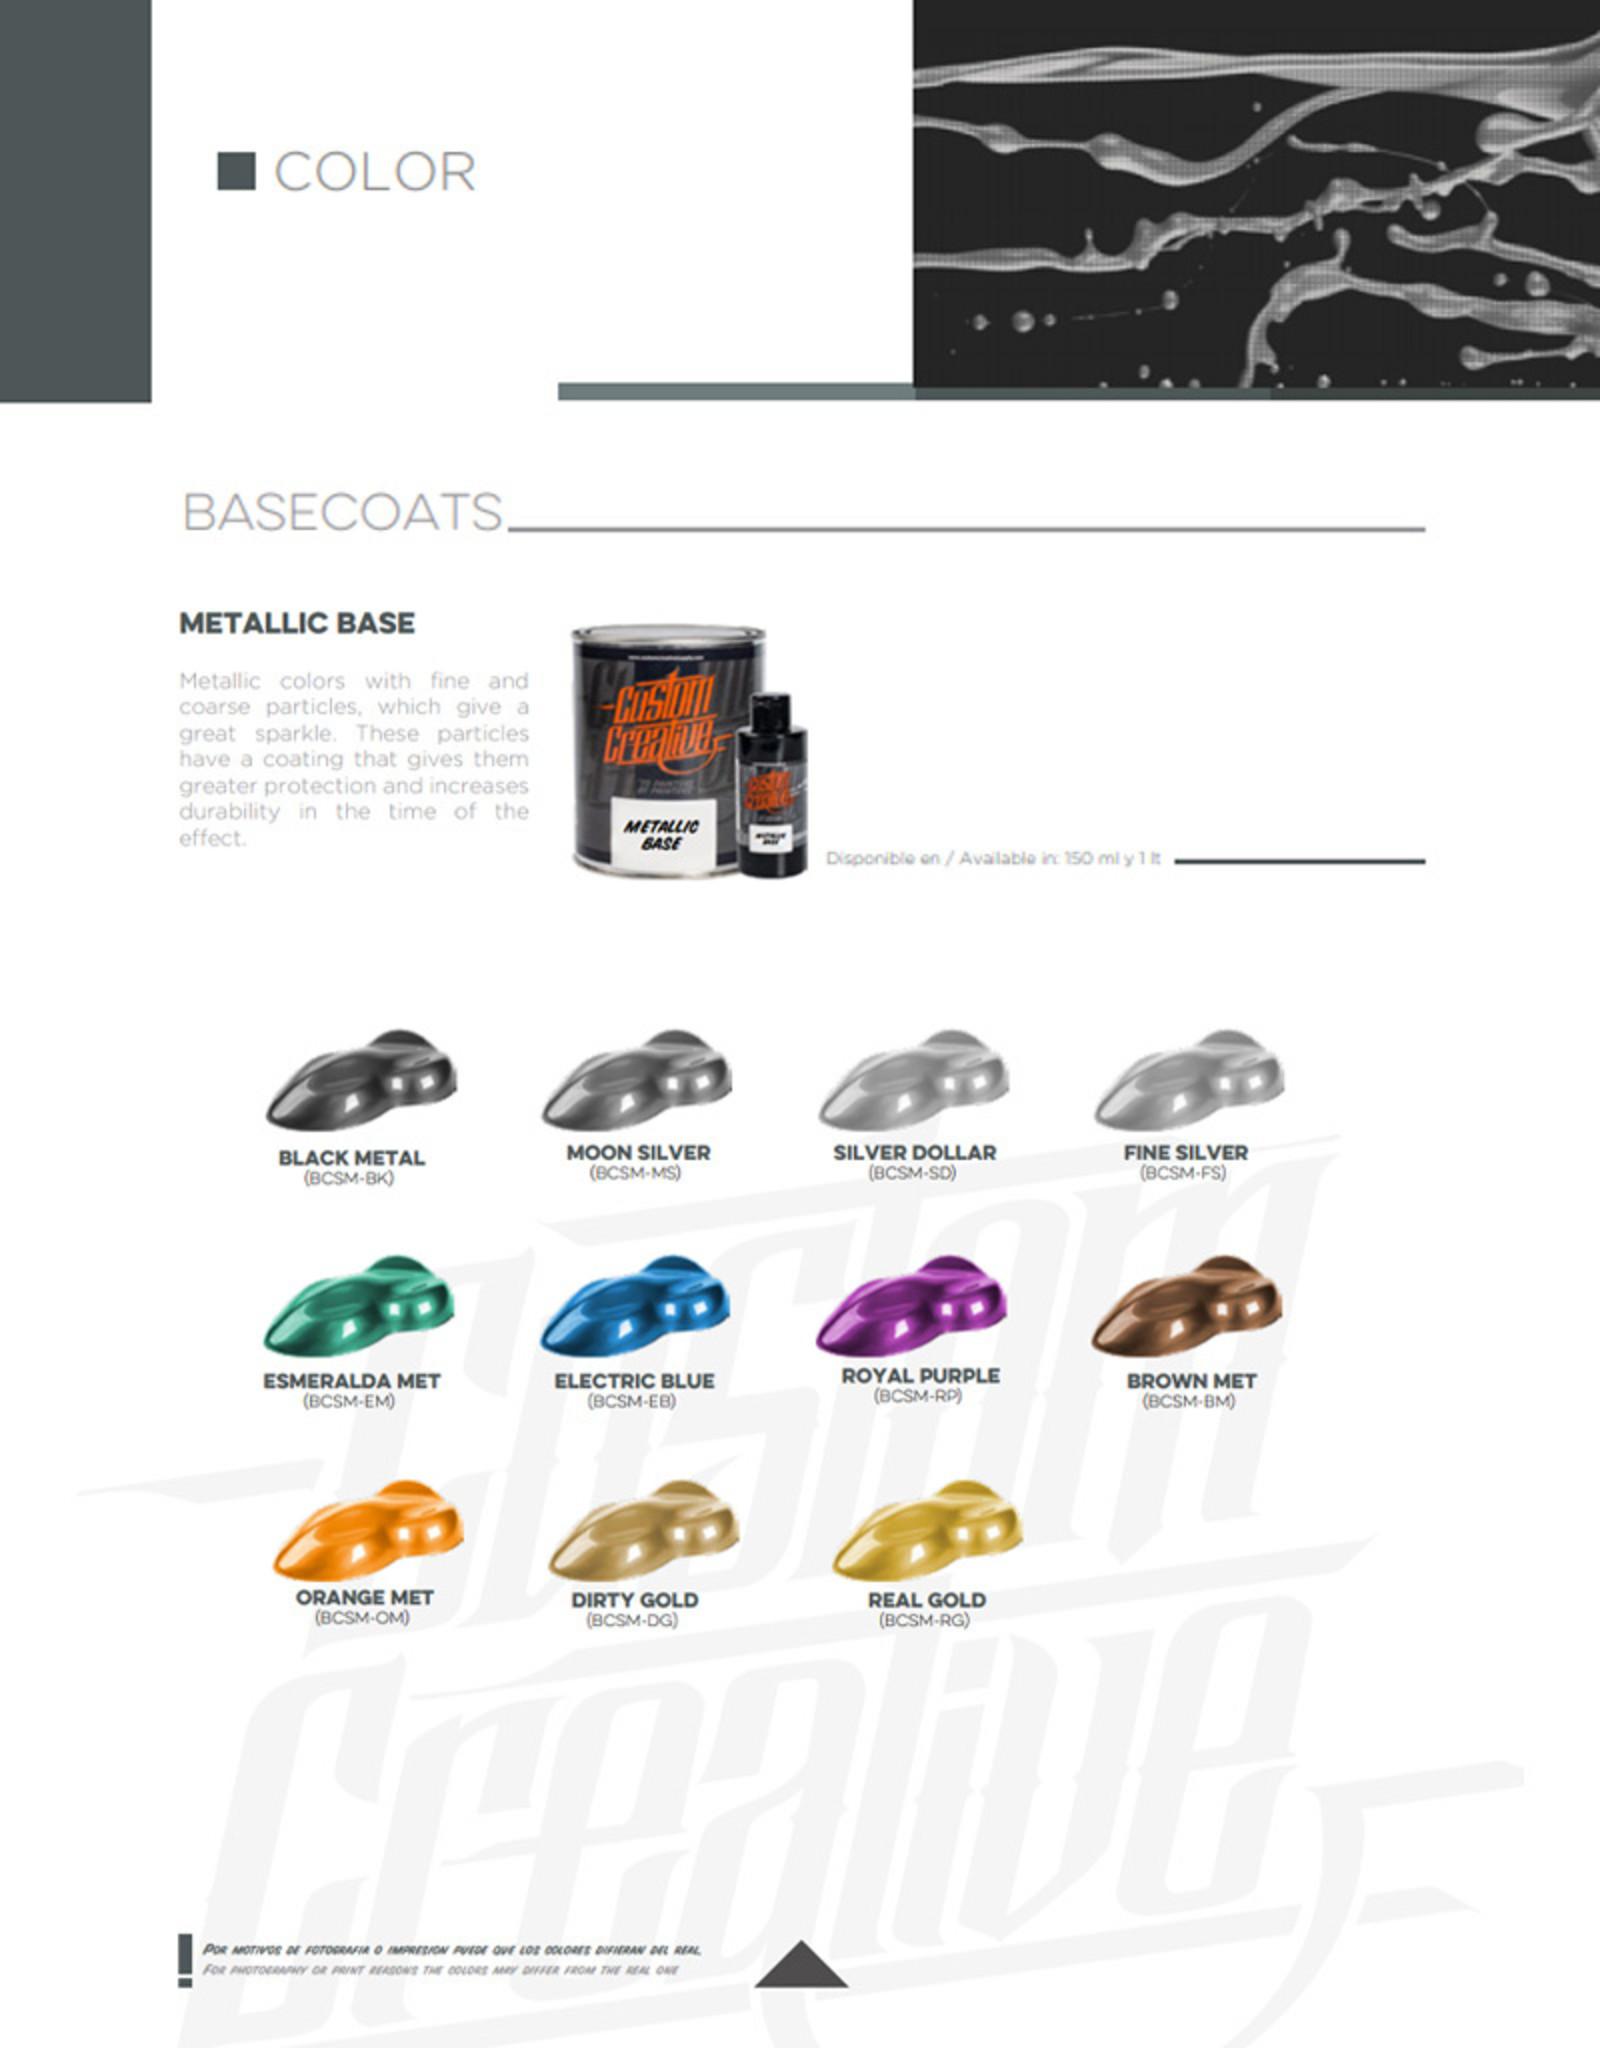 Custom Creative Custom Creative Base Color Metallic - Brown Met